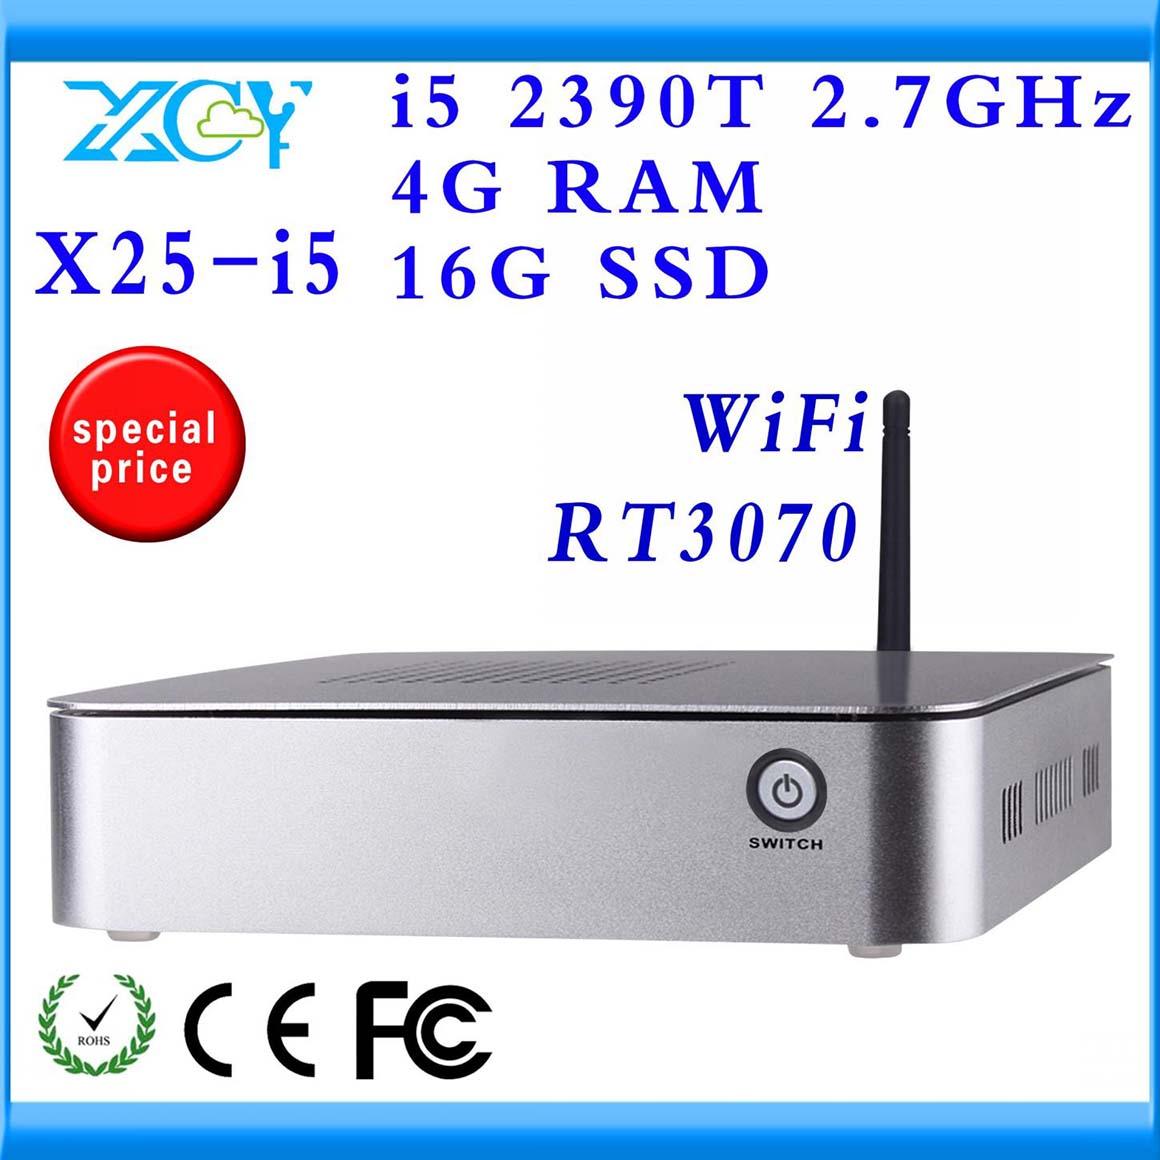 Aluminium HTPC Computer Case Pc host XCY X25-I5 SSD 8GB(standard) Hard Drive Capacity(China (Mainland))